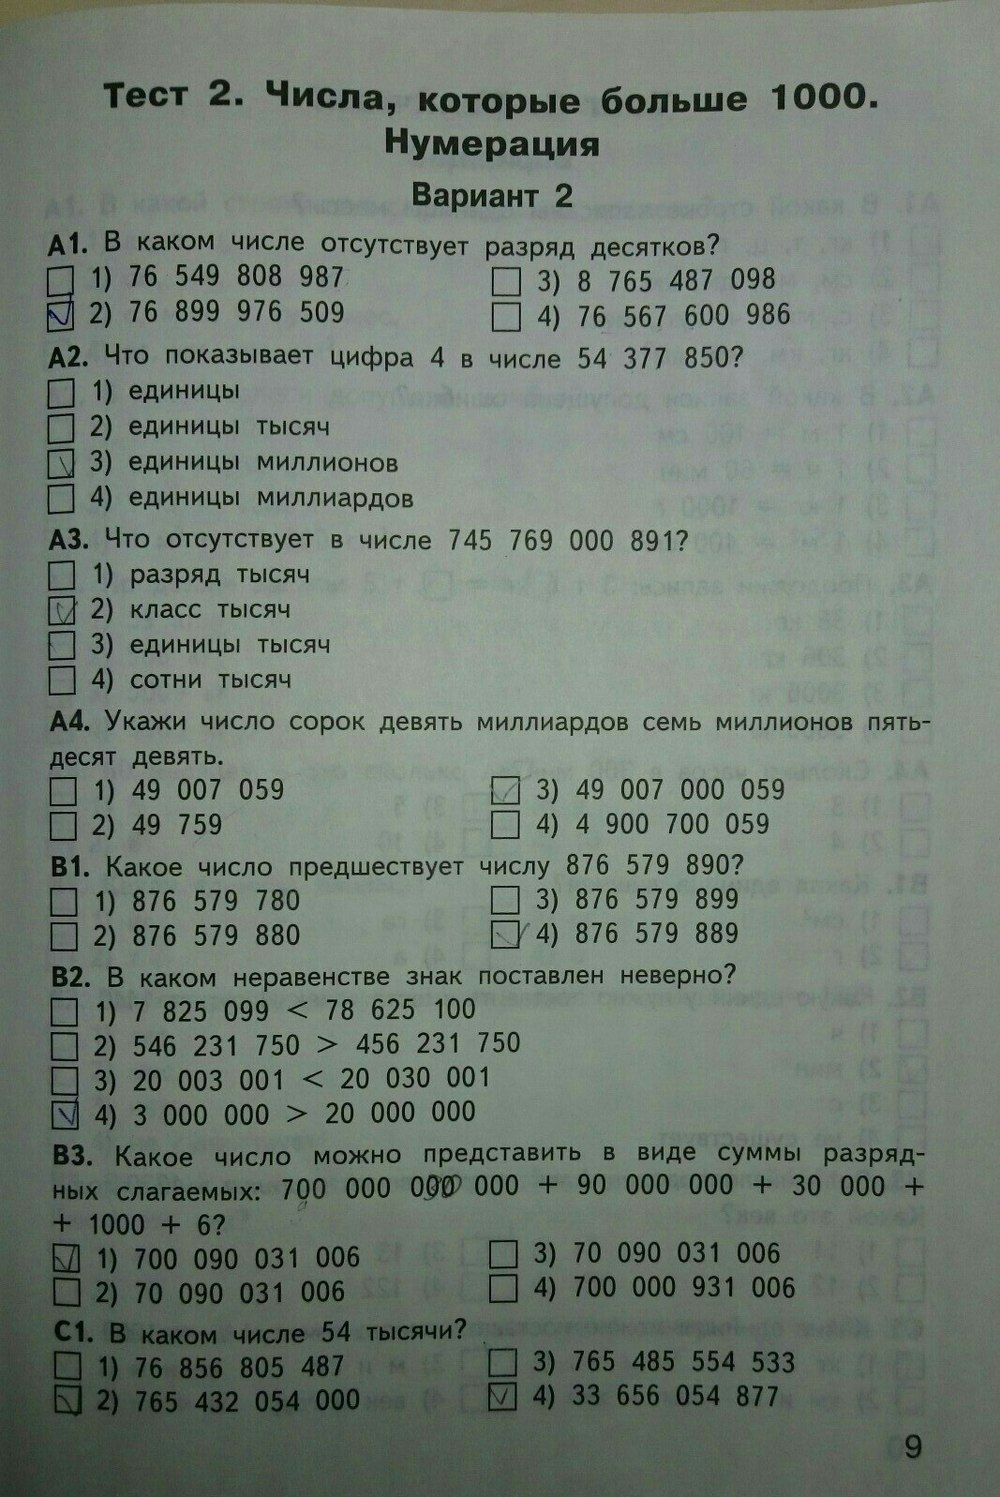 Решебник по татарскому за 10 класс малафеева хайдарова